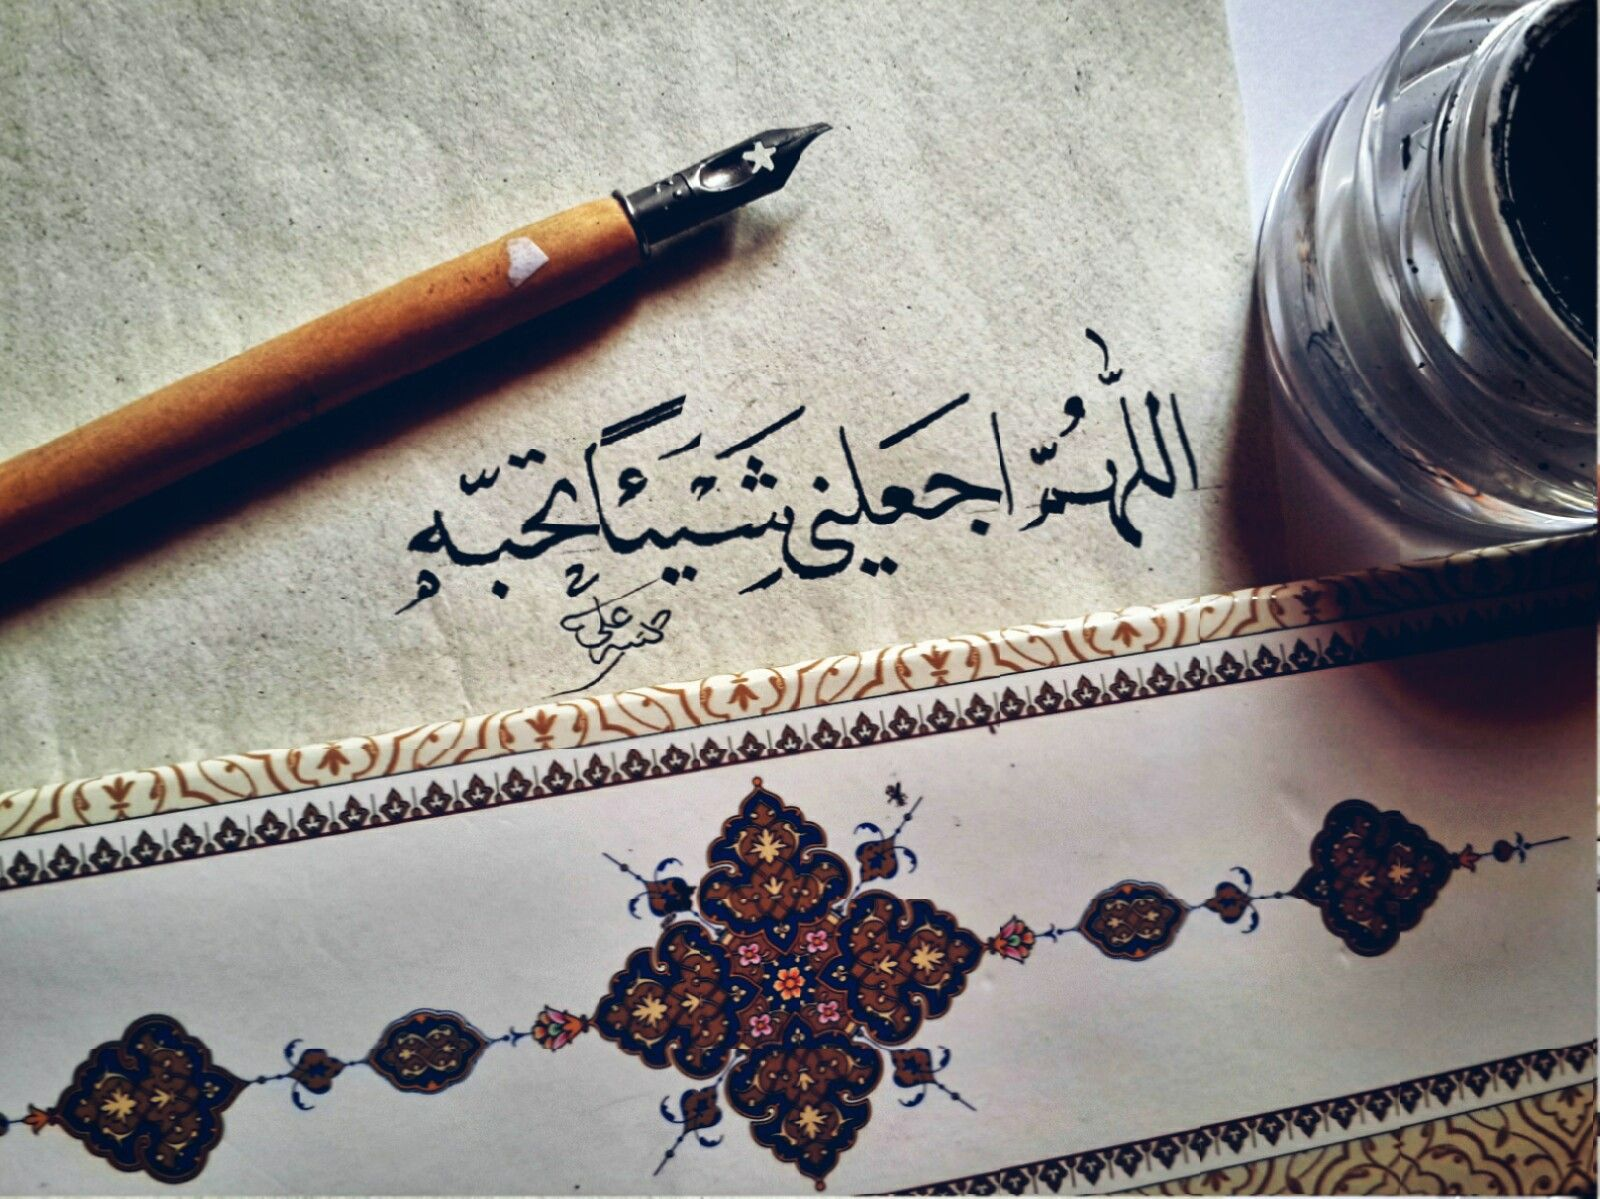 اللهم اجعلني شيئا ت حبه خطي Calligraphy I Arabic Art Simple Words